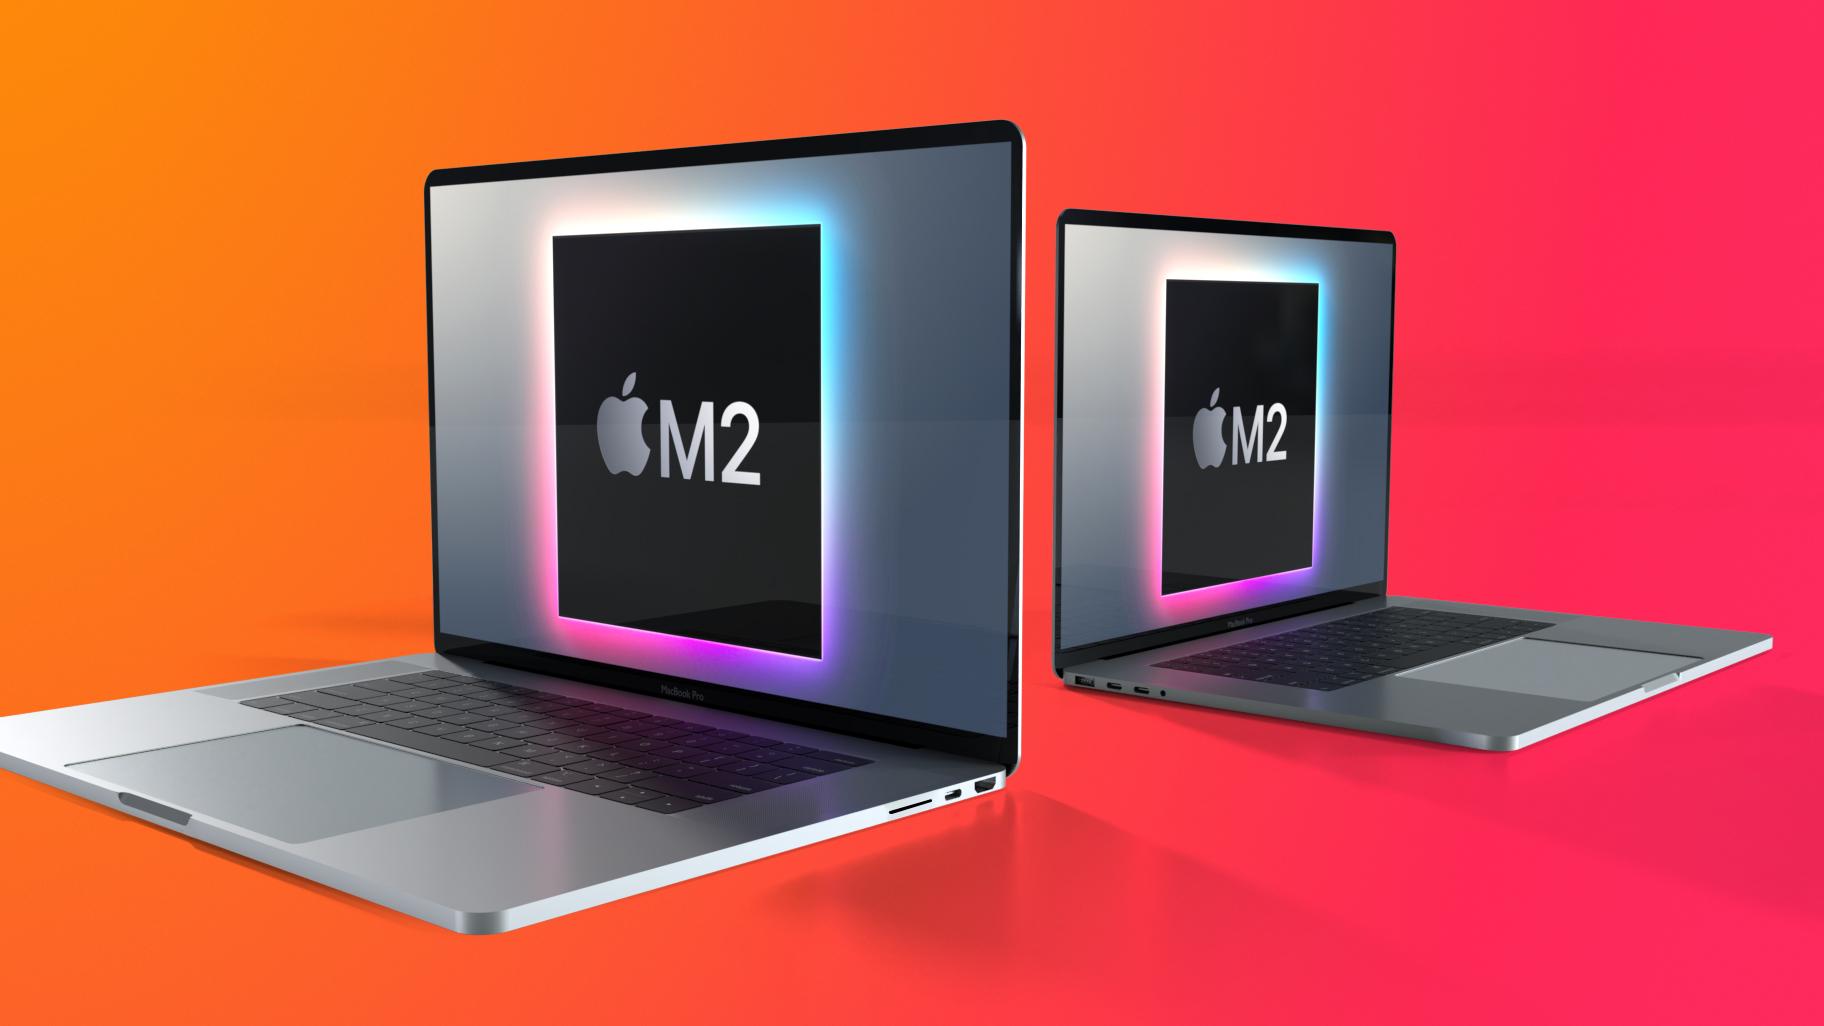 Next-Generation 16-Inch MacBook Pro Seemingly Filed in Regulatory Database Ahead of WWDC